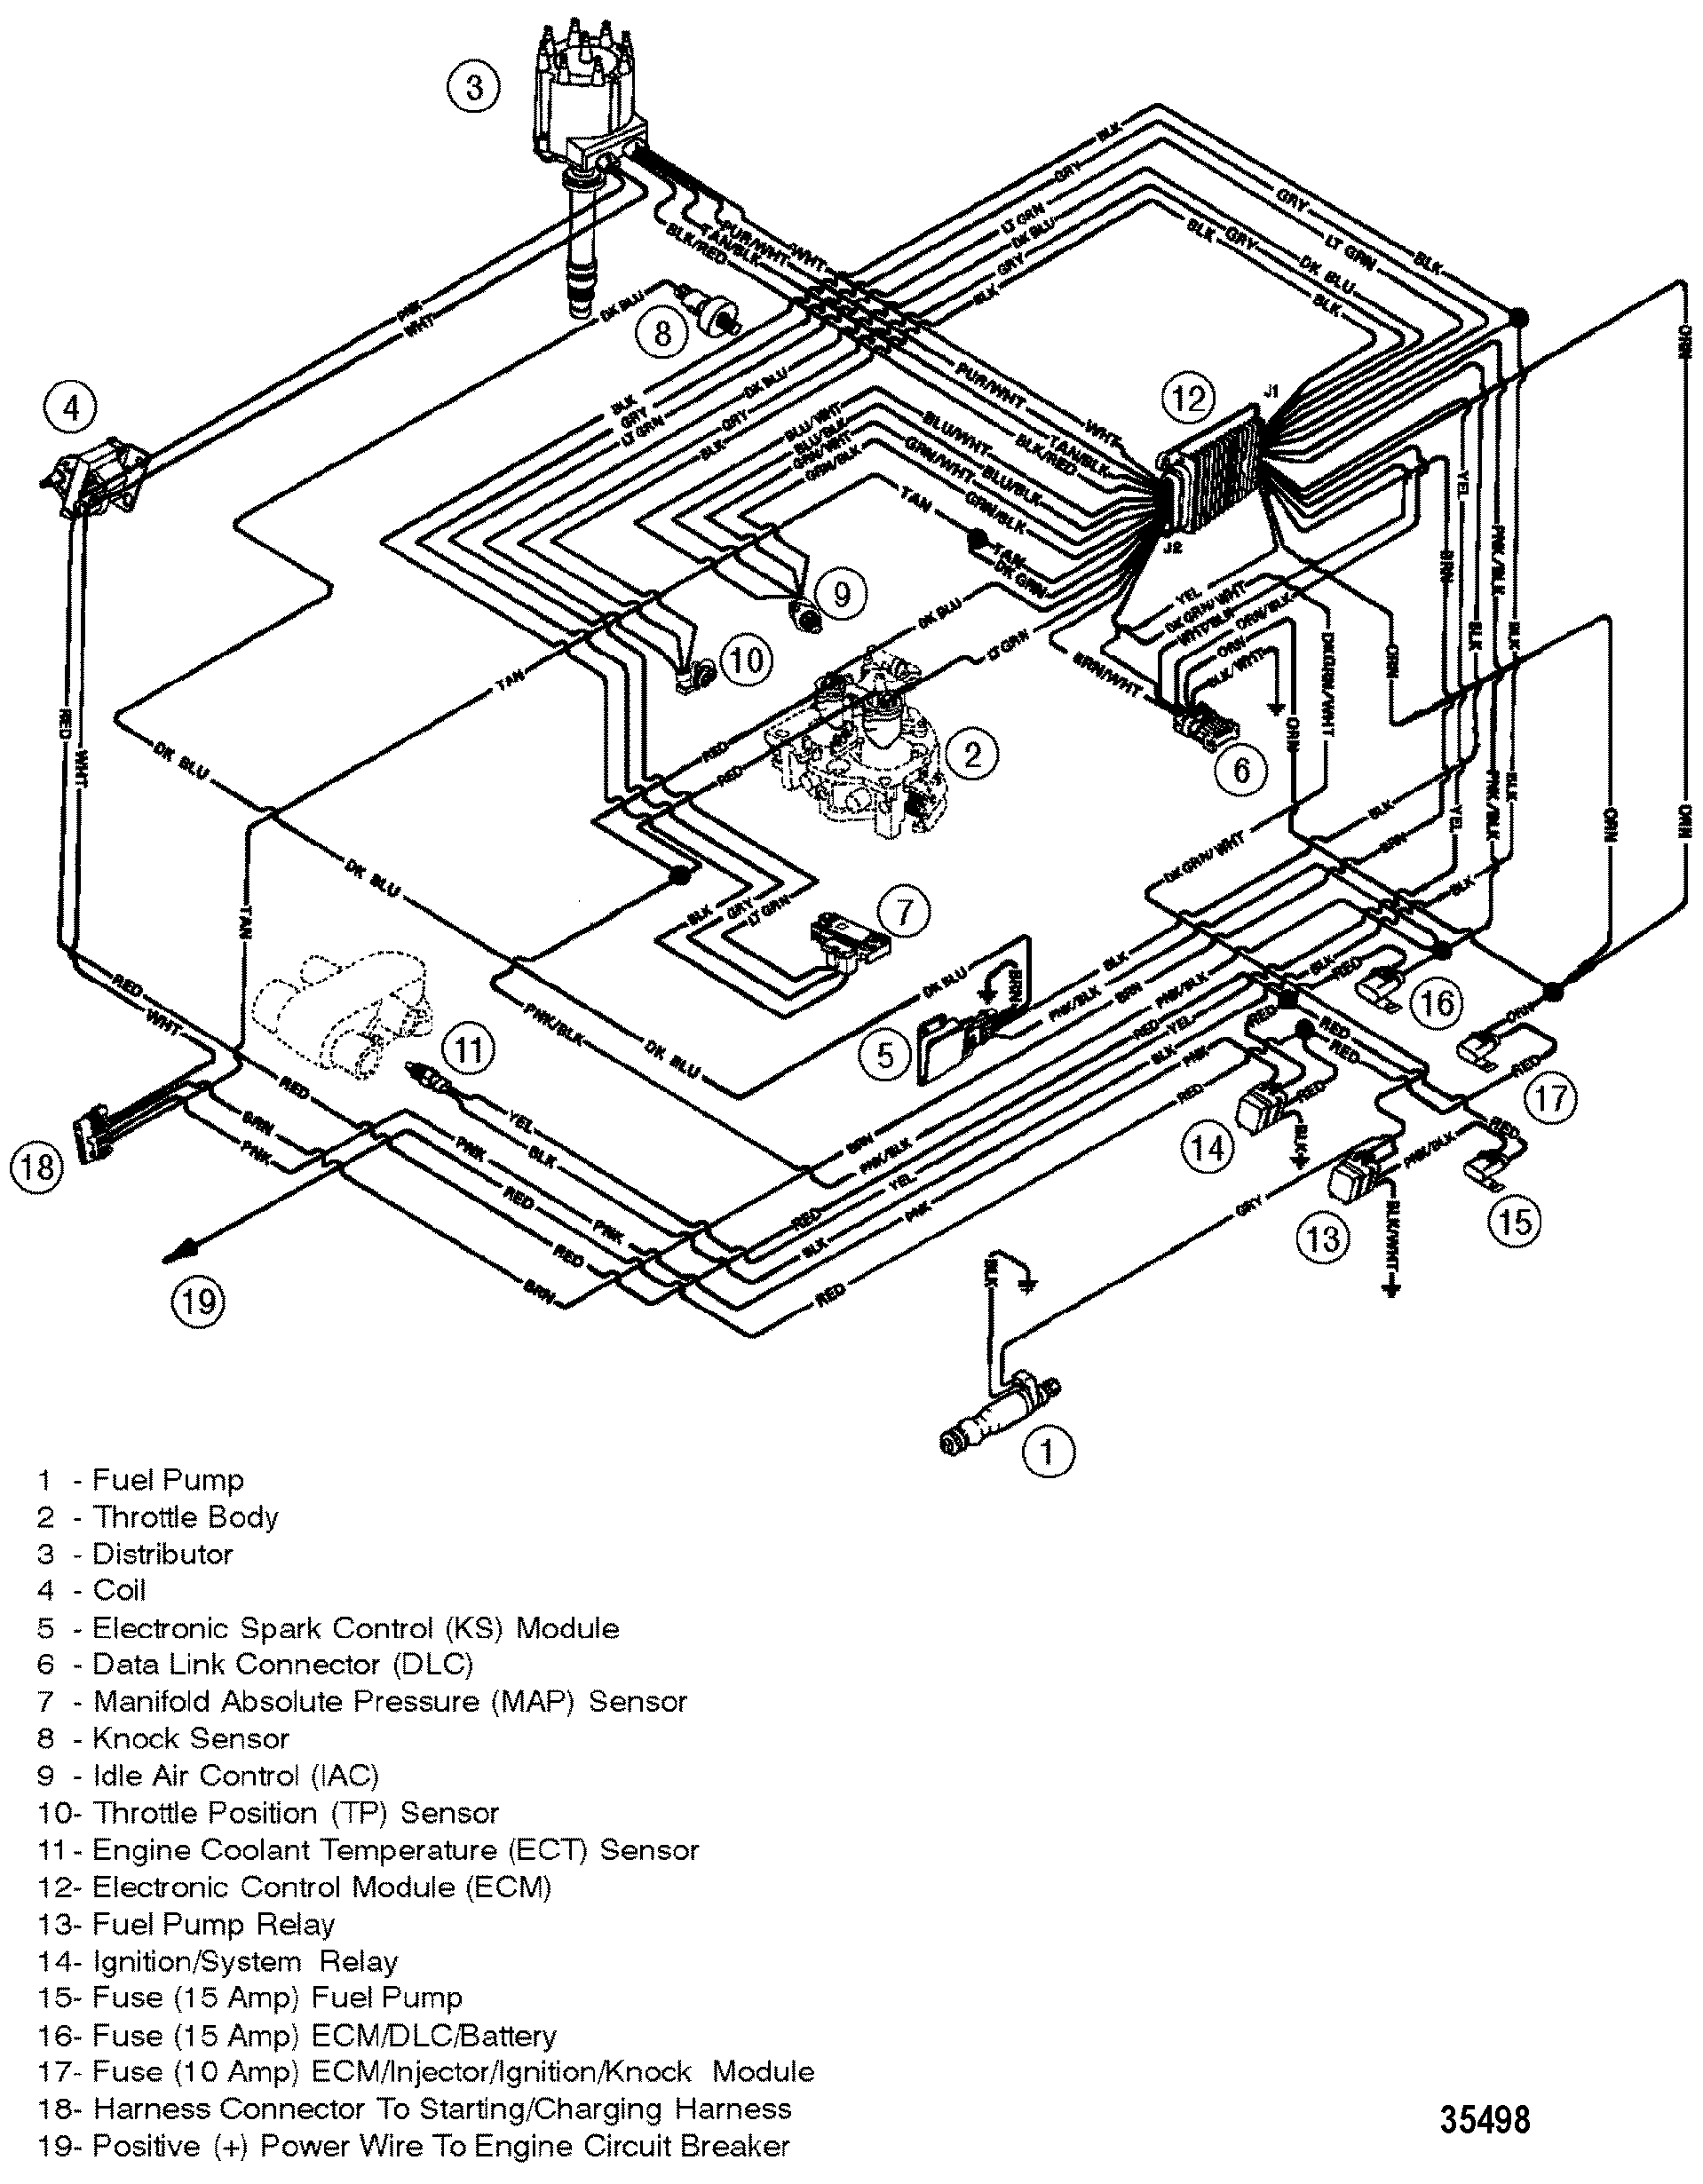 Efi Wiring Harness Detailed Schematics Diagram Ls1 Engine Click The Image To Hardin Marine Honda Accord